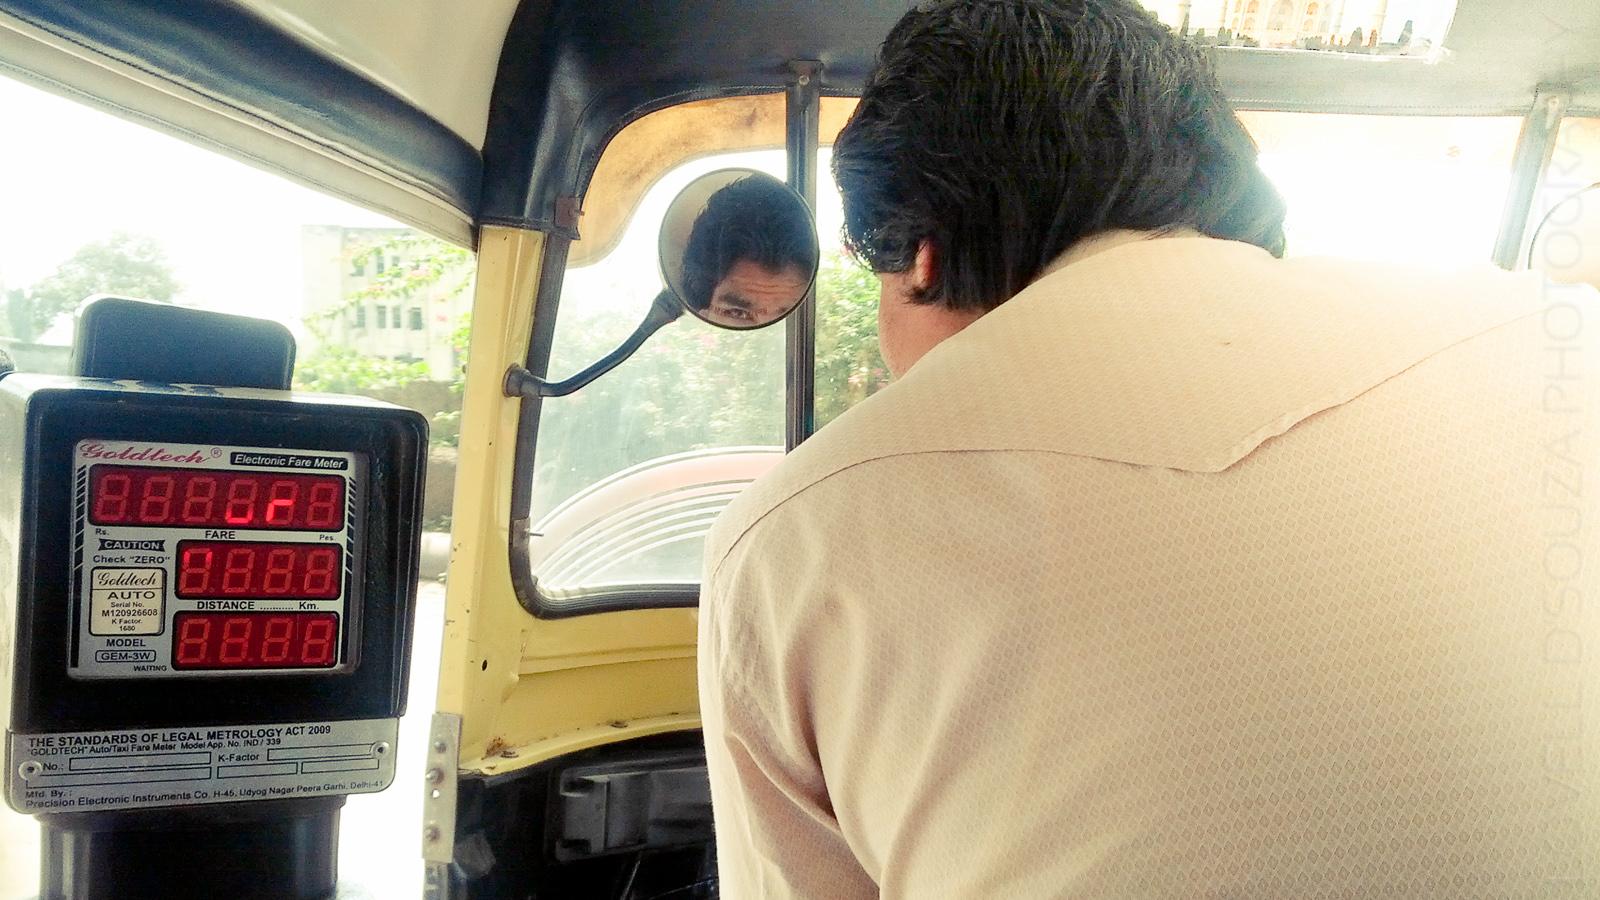 Bibi Ka Maqbara - The Ride Back